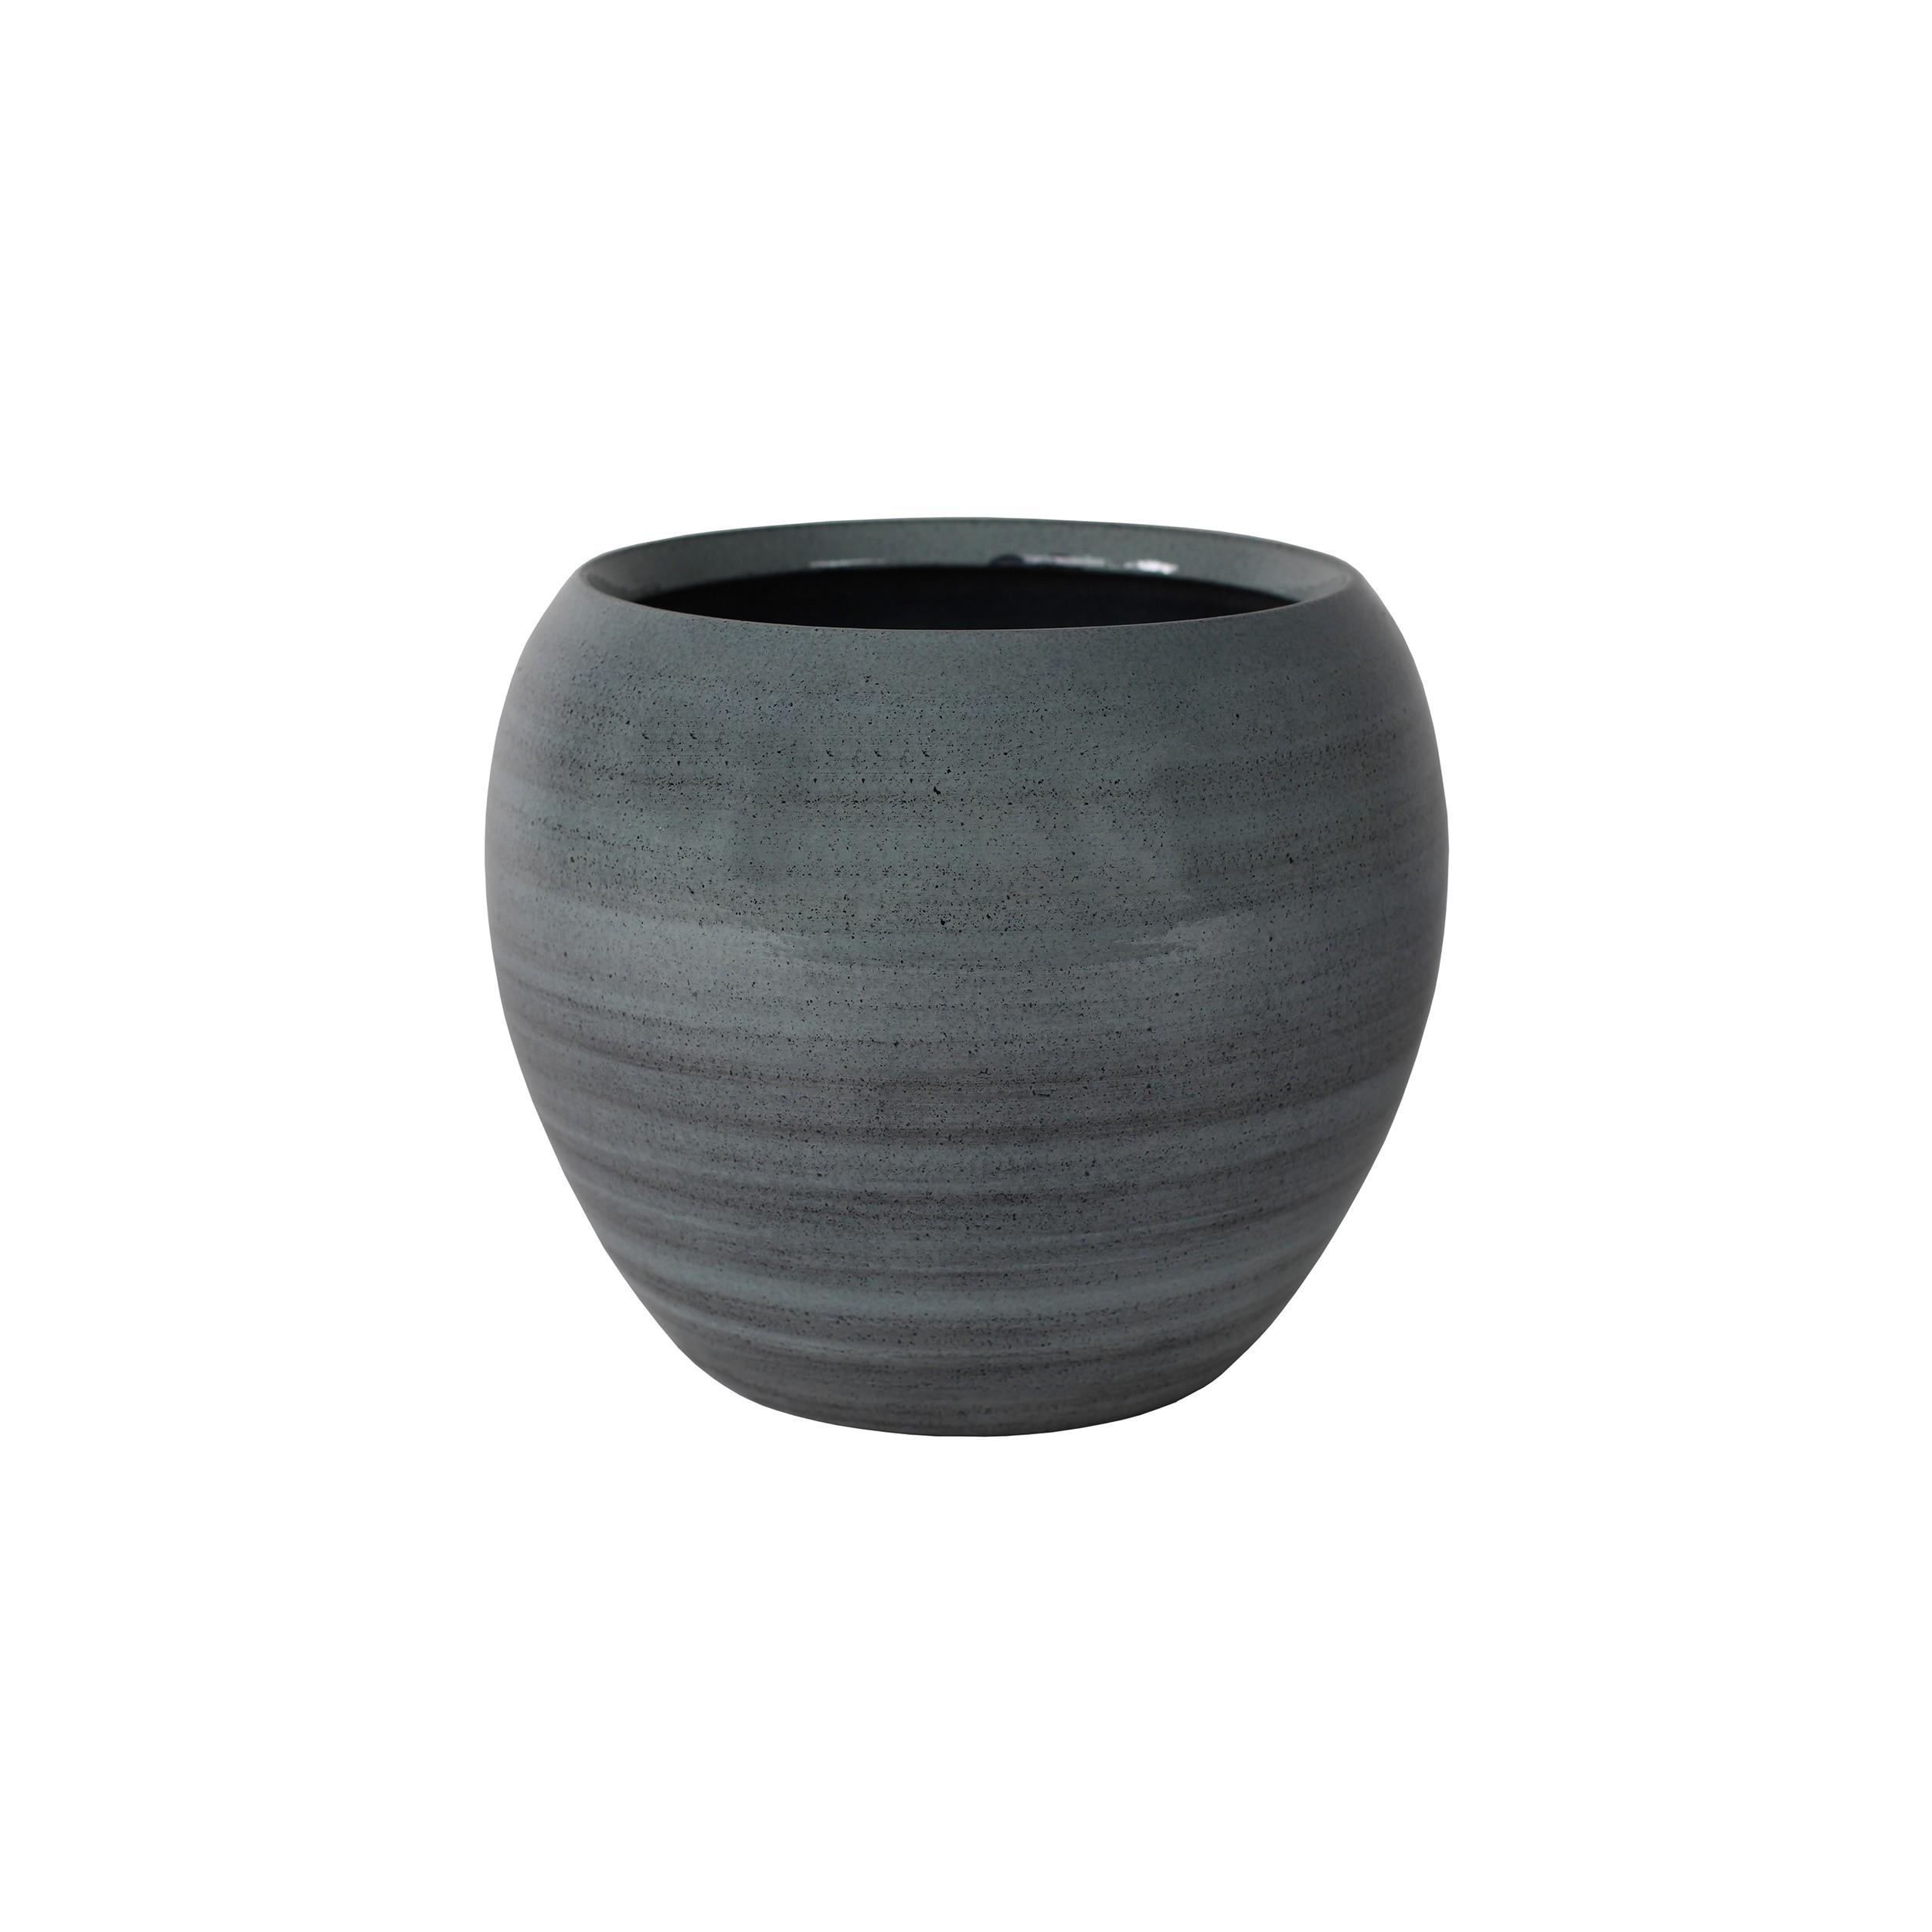 Keramik blumentopf cresta d14cm for Blumentopf keramik